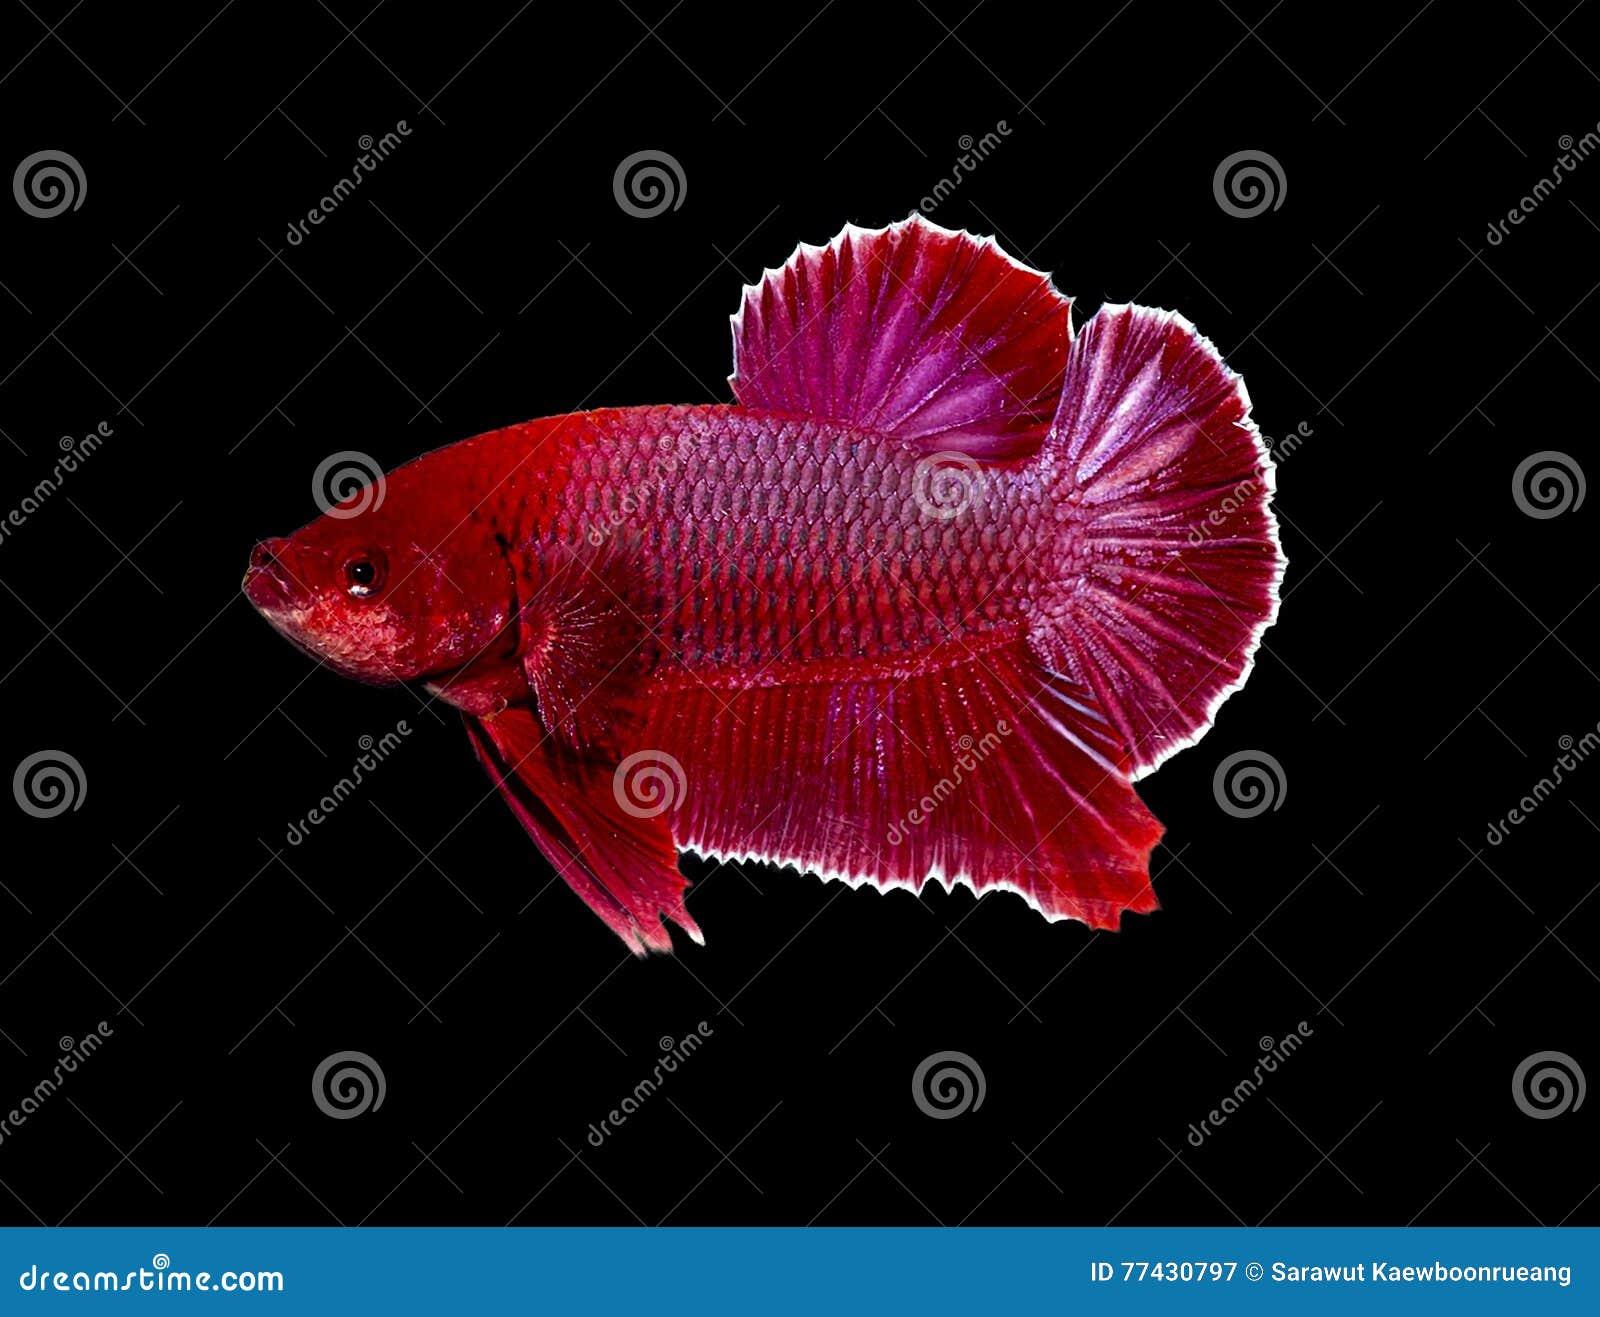 Siamese Fighting Fish, Betta Fish Isolated On Black Stock Image ...